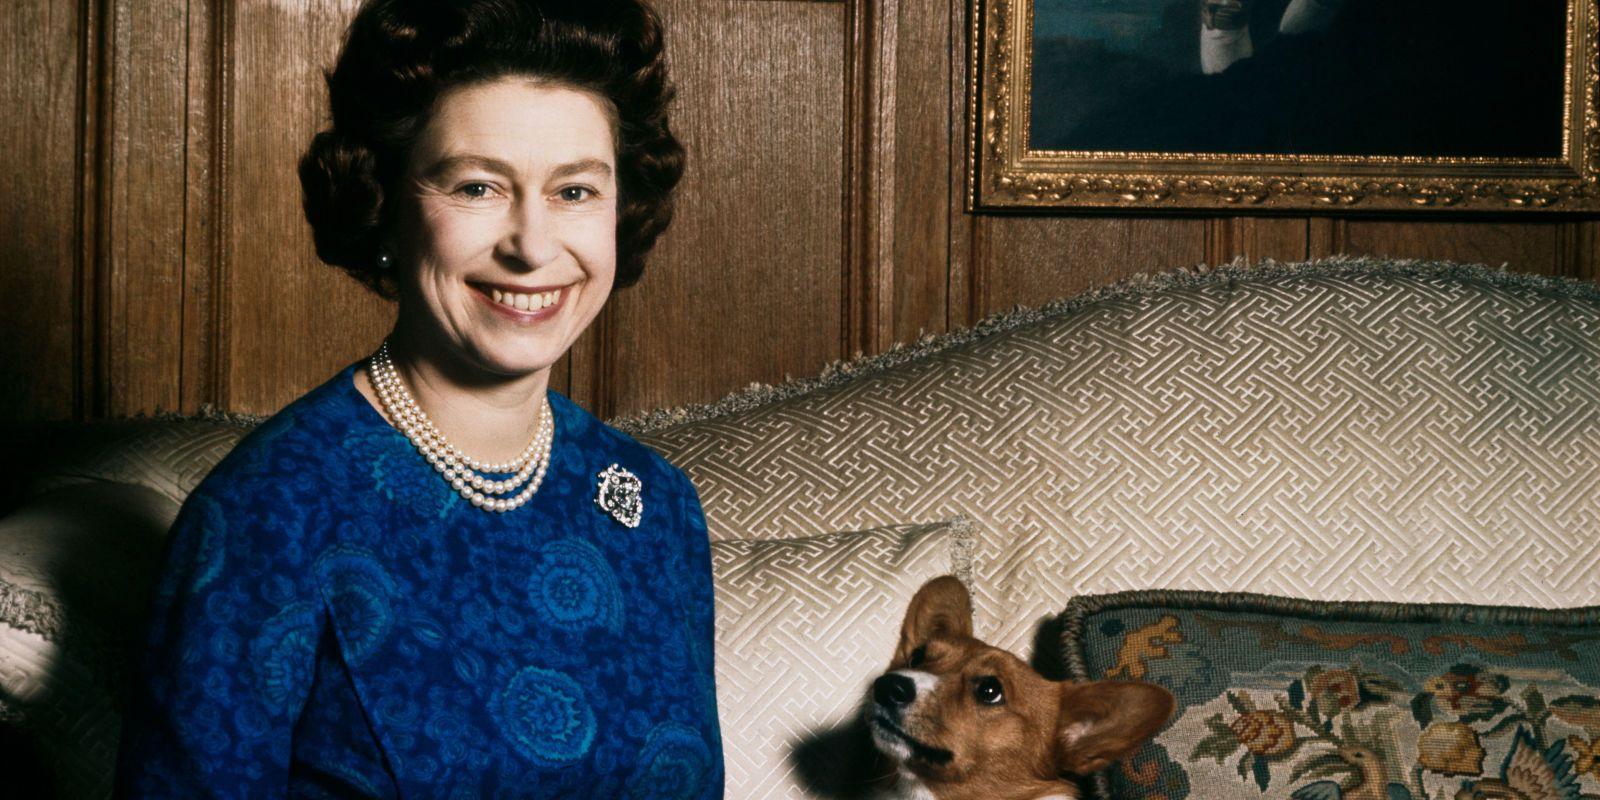 The Queen S Dog Trainer Spills About The Life Of A Royal Corgi Corgi Queen History Of Queen Elizabeth Elizabeth Ii